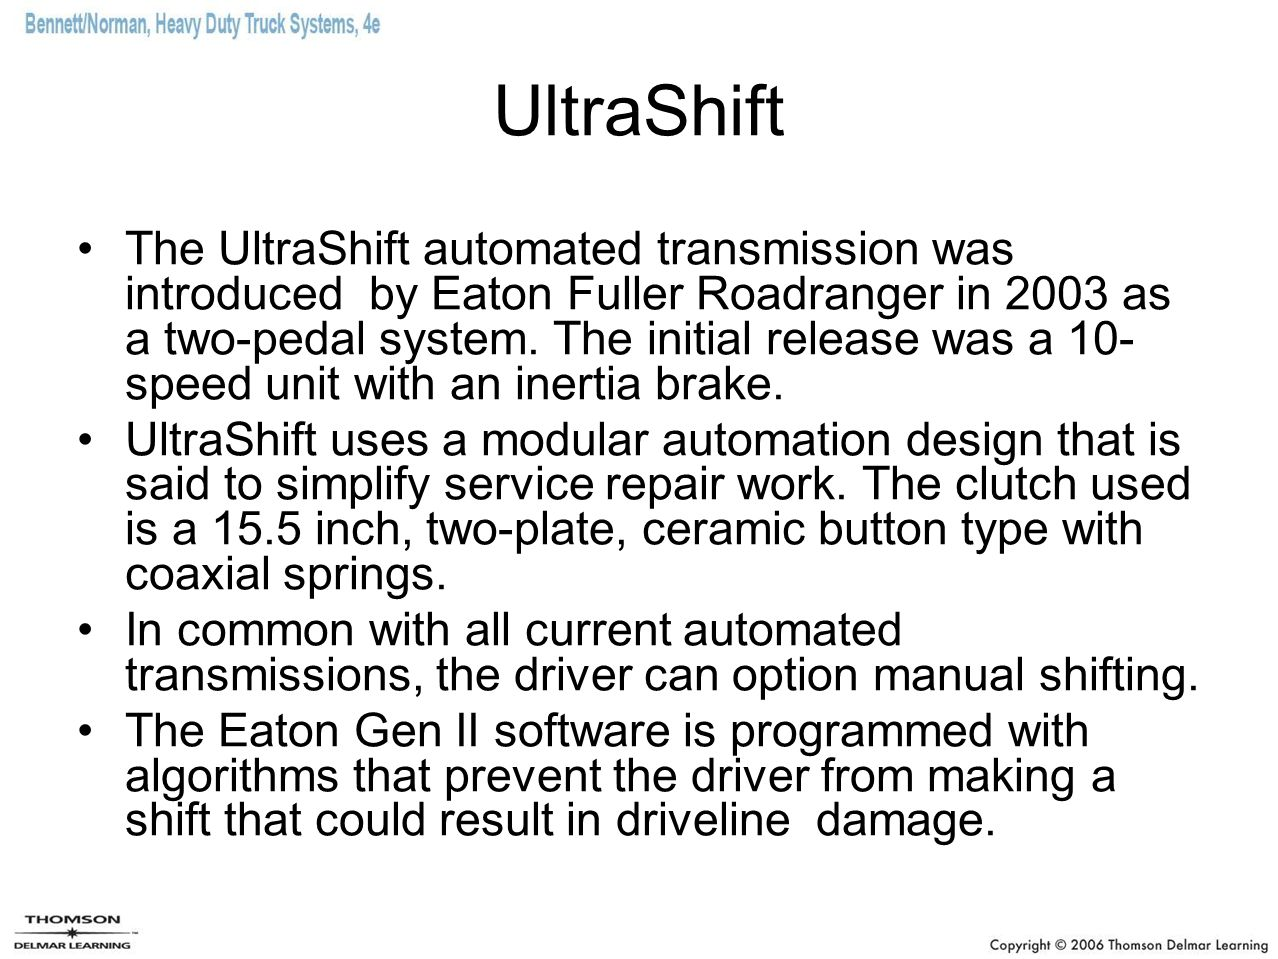 UltraShift